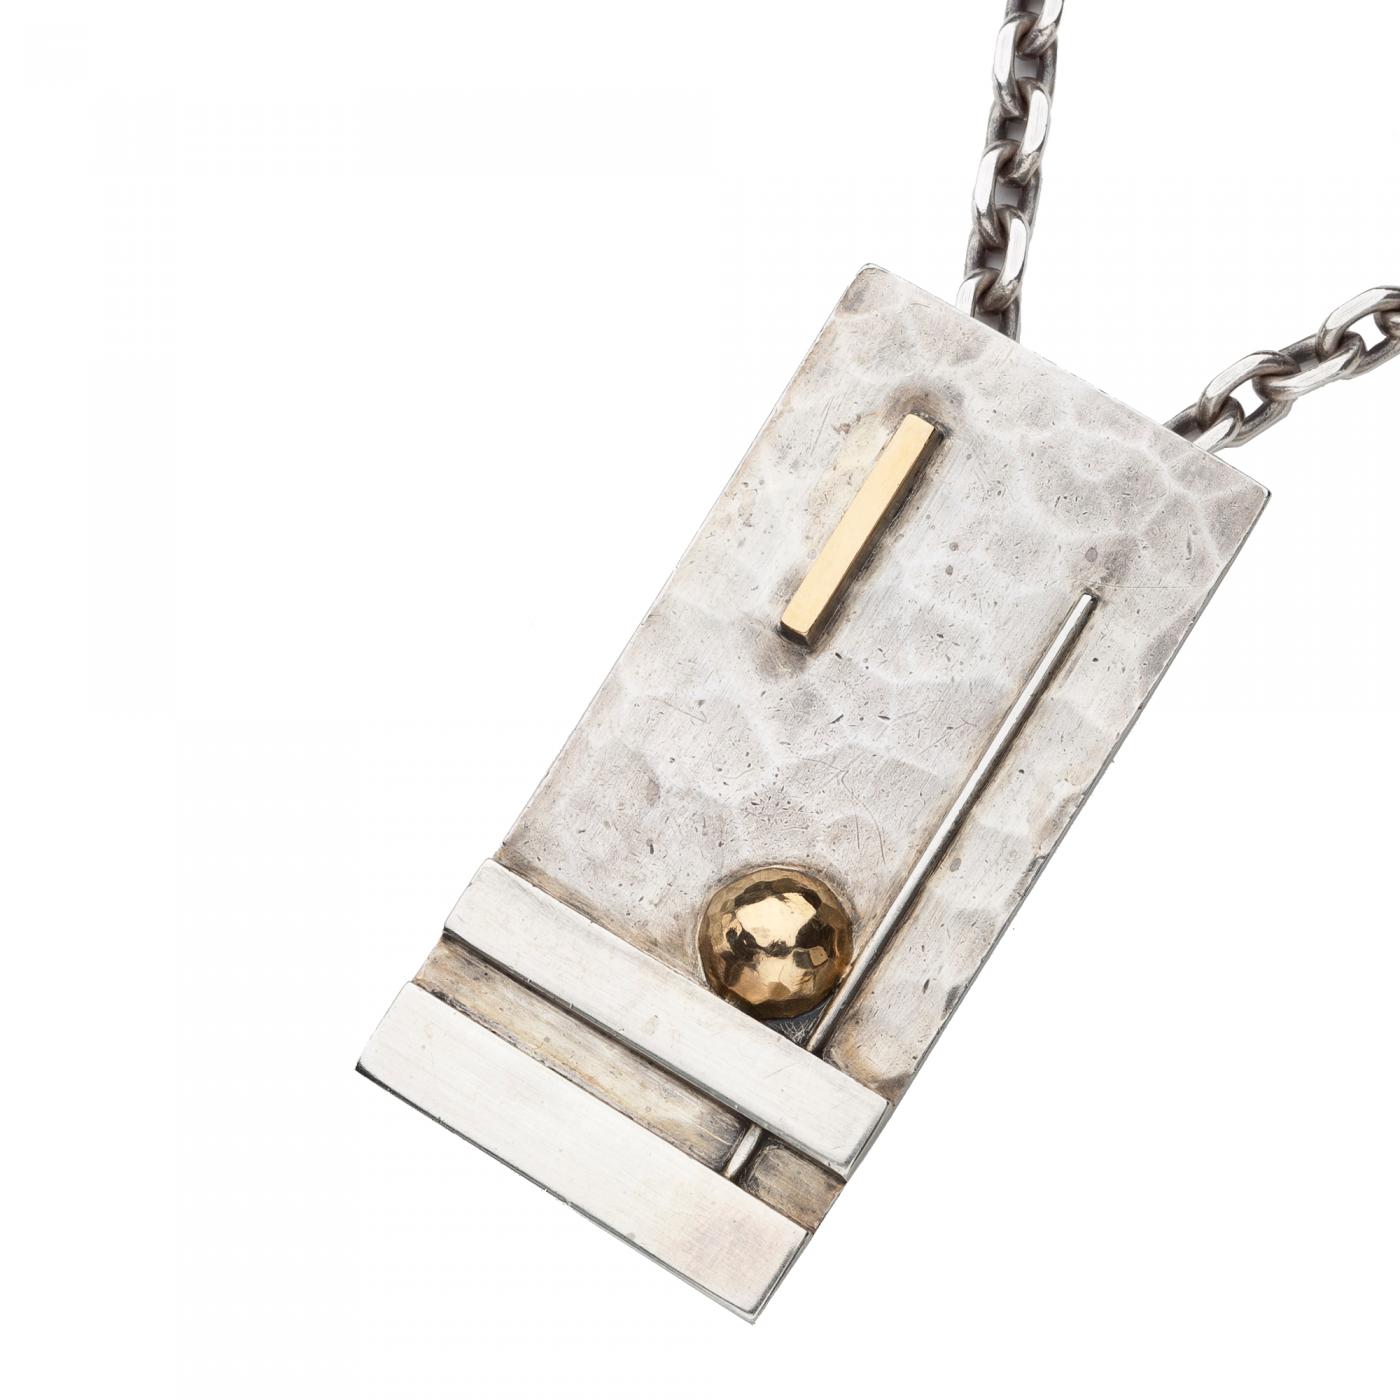 Jean despres art deco pendant c 1930 listings jewelry necklaces pendants drop pendant jean despres art deco aloadofball Images